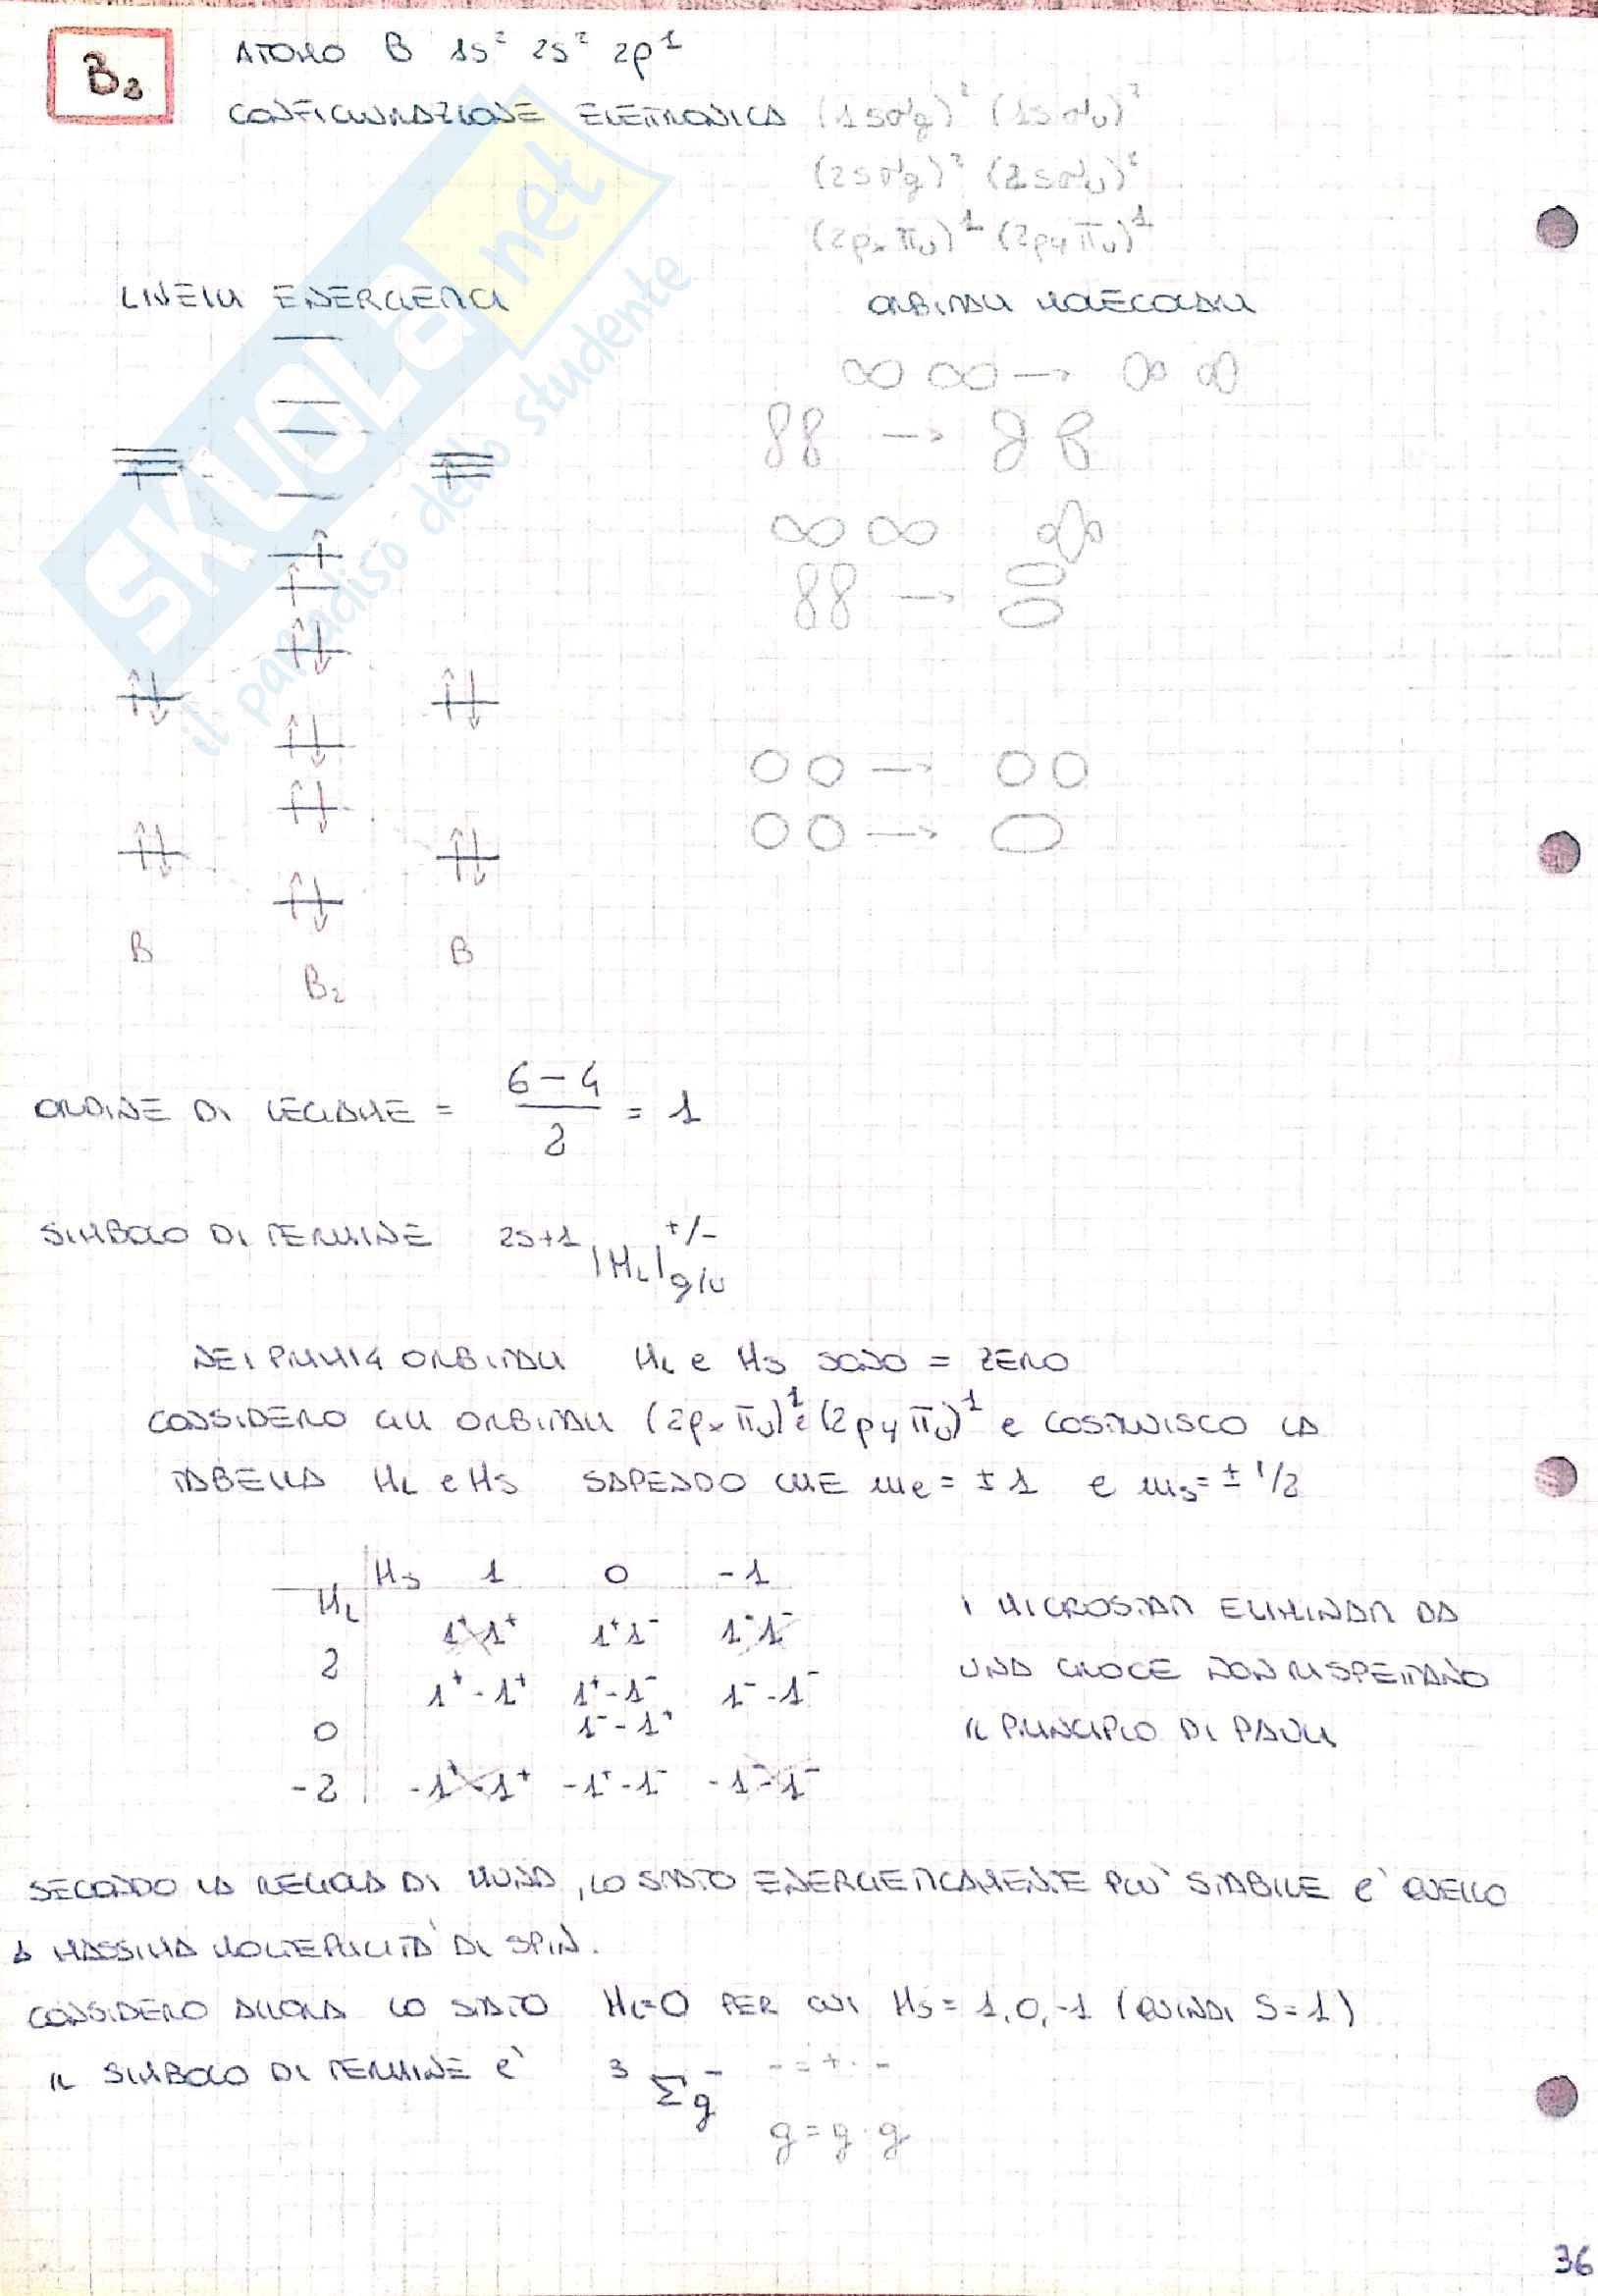 Chimica fisica II Pag. 36